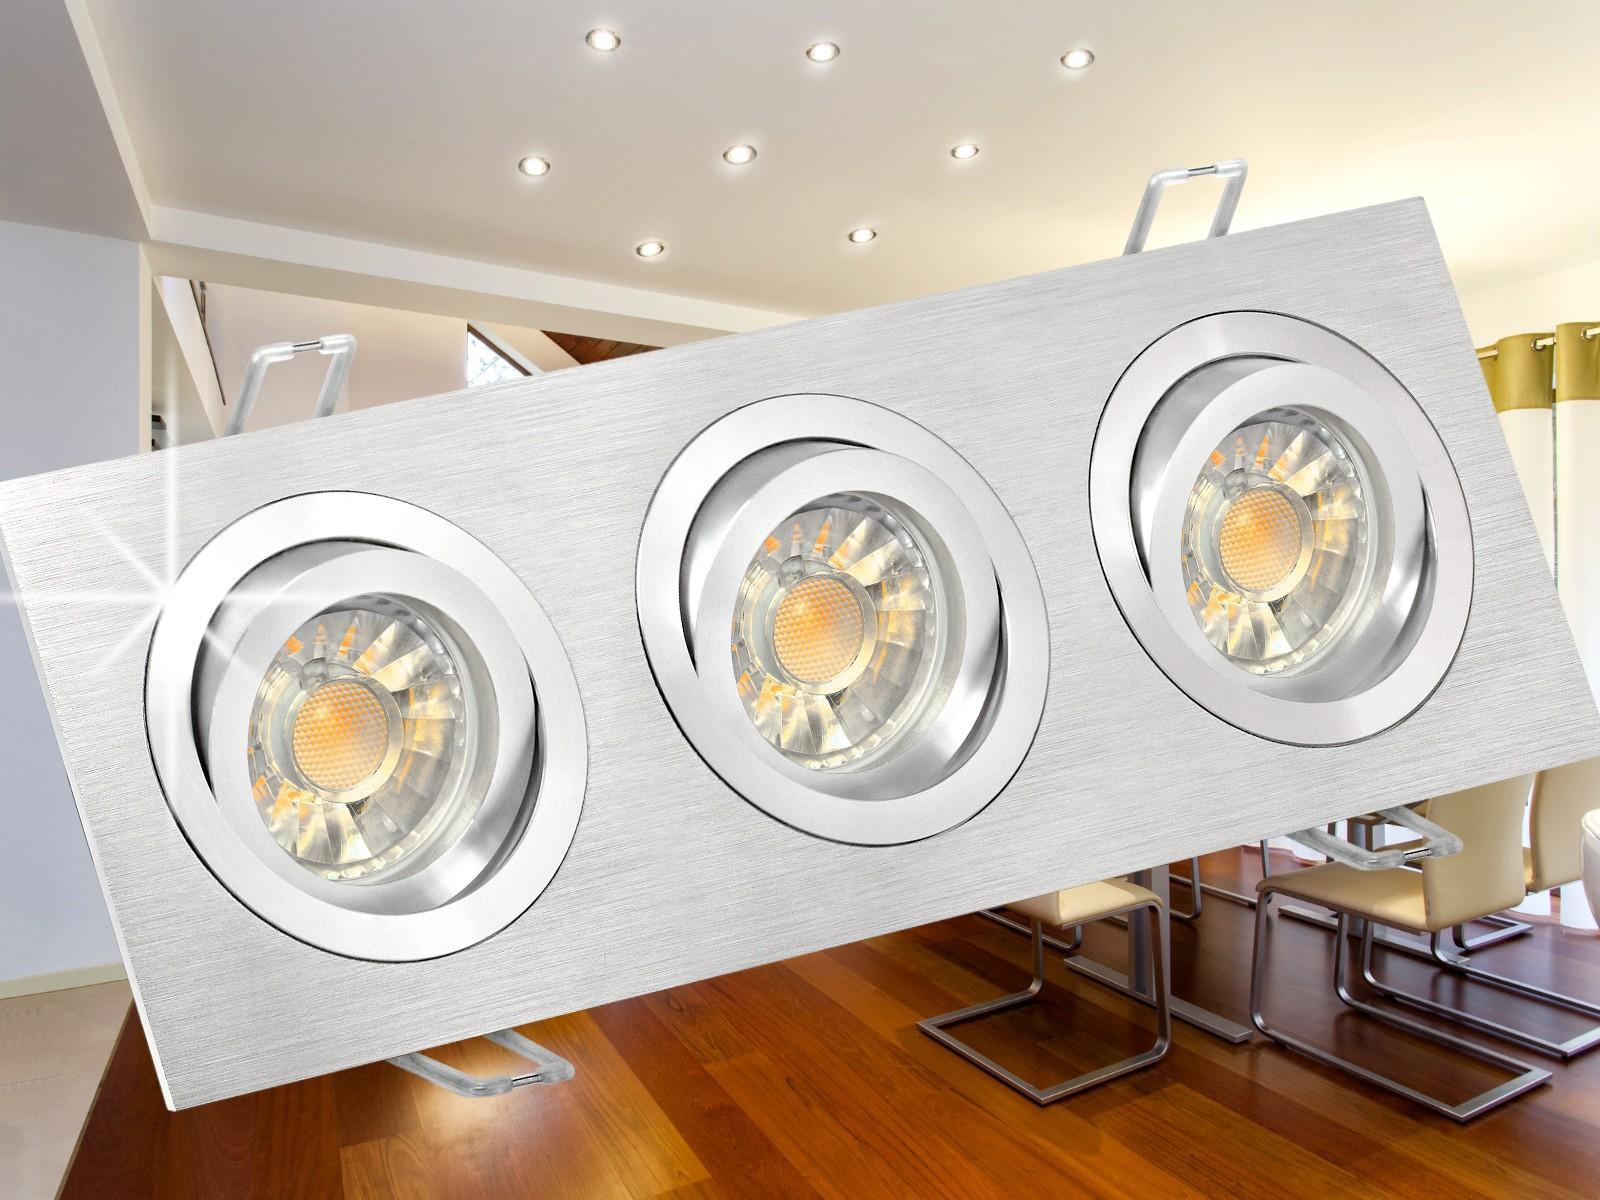 qf 2 3 alu led einbaustrahler schwenkbar 3x 3w smd warmwei gu10 230v in sch ner halogenoptik. Black Bedroom Furniture Sets. Home Design Ideas